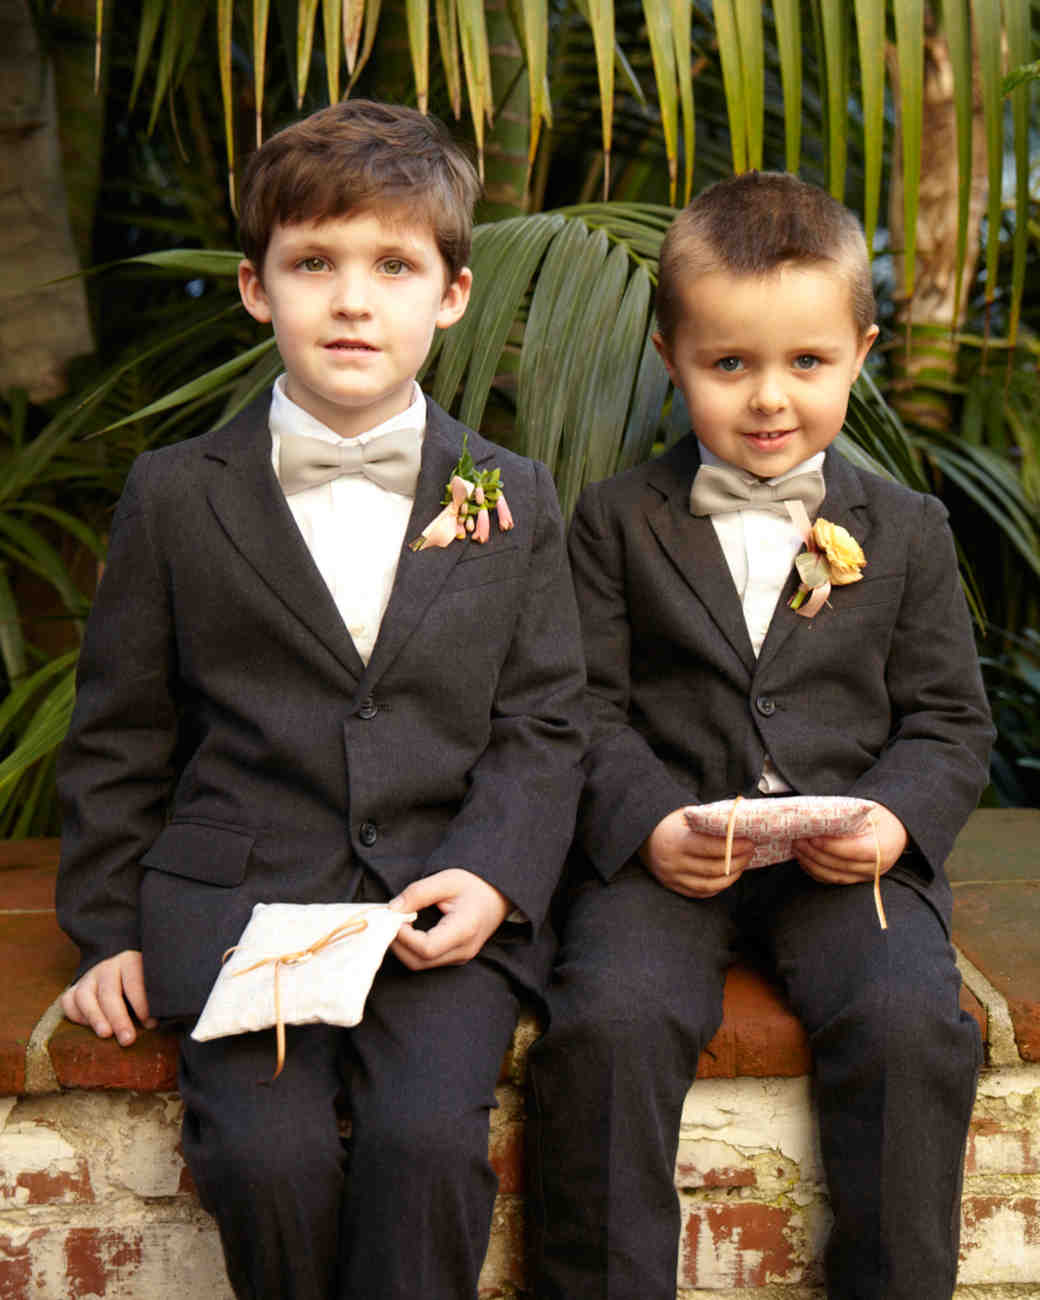 kristi-jeff-cute-kids-wd109382.jpg